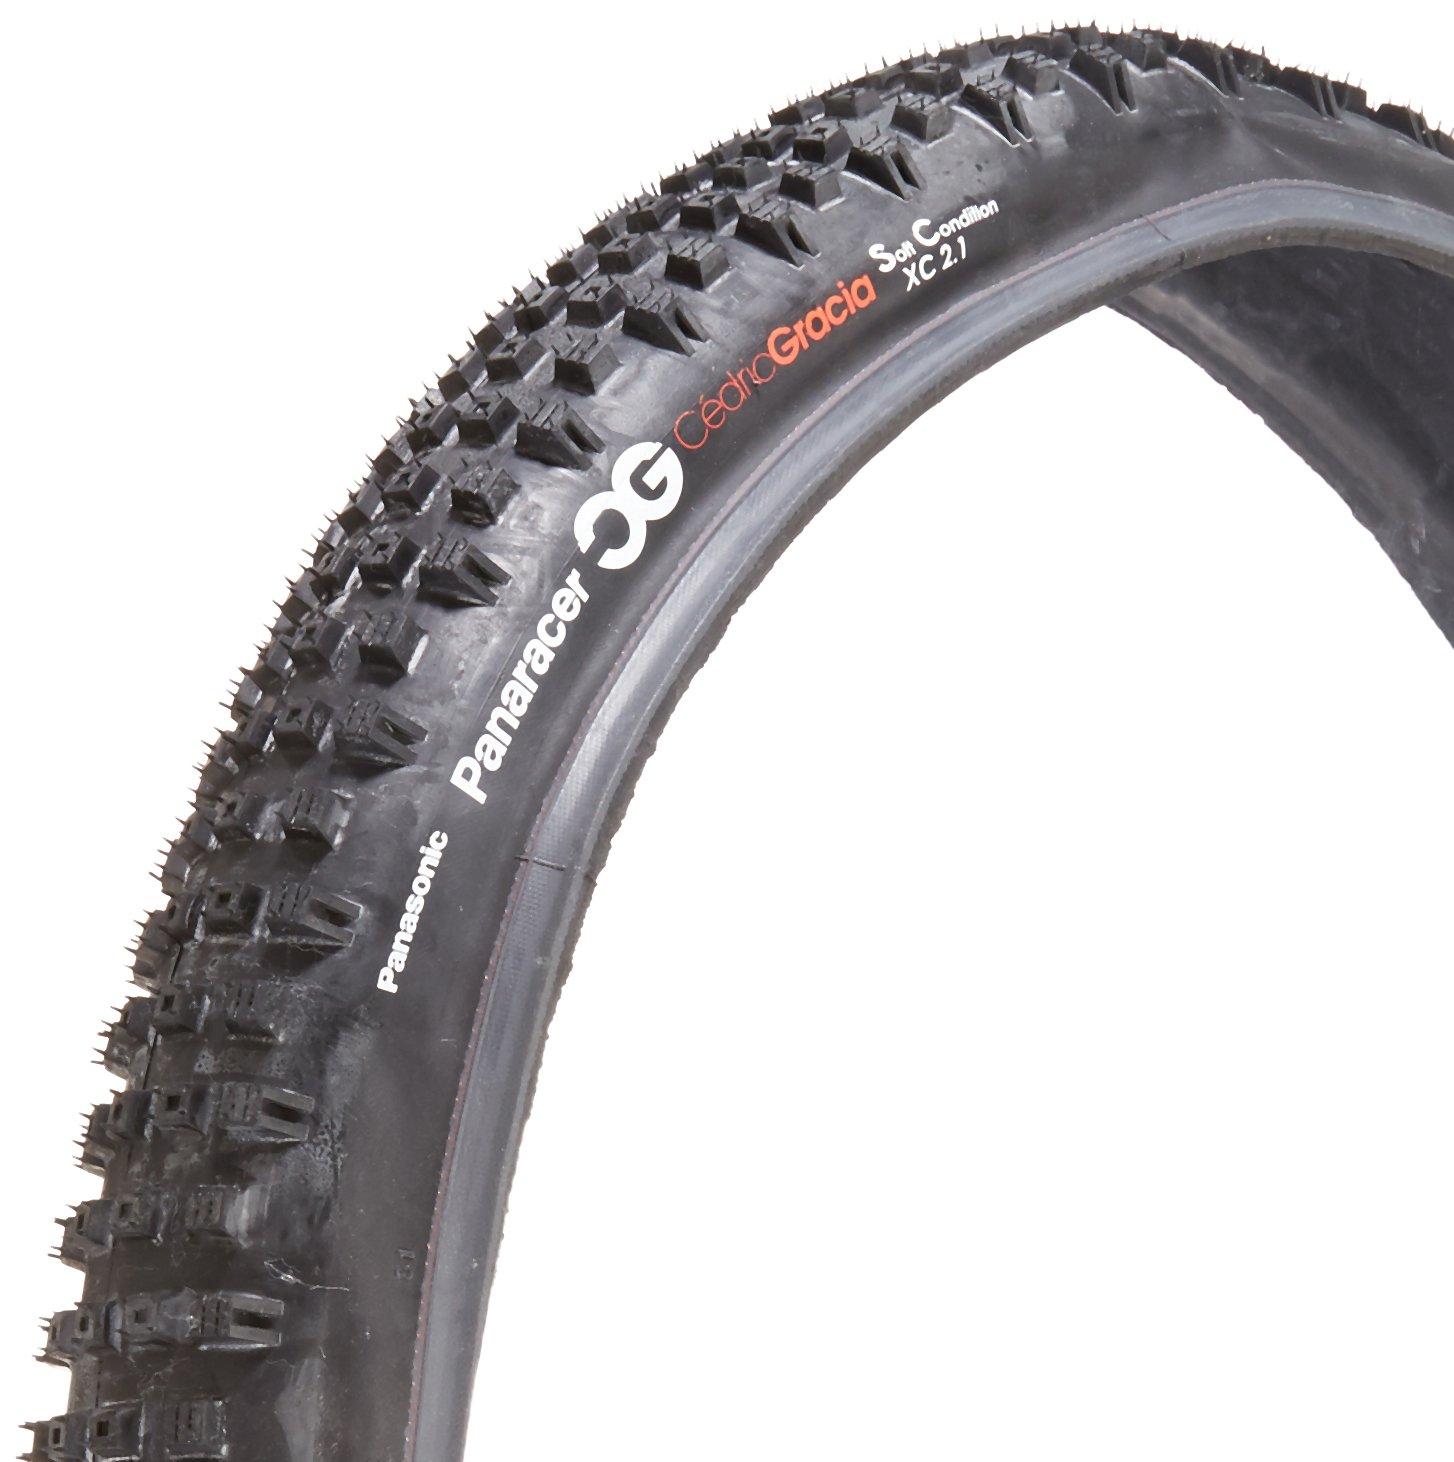 Panaracer CG SC Tire with Folding Bead